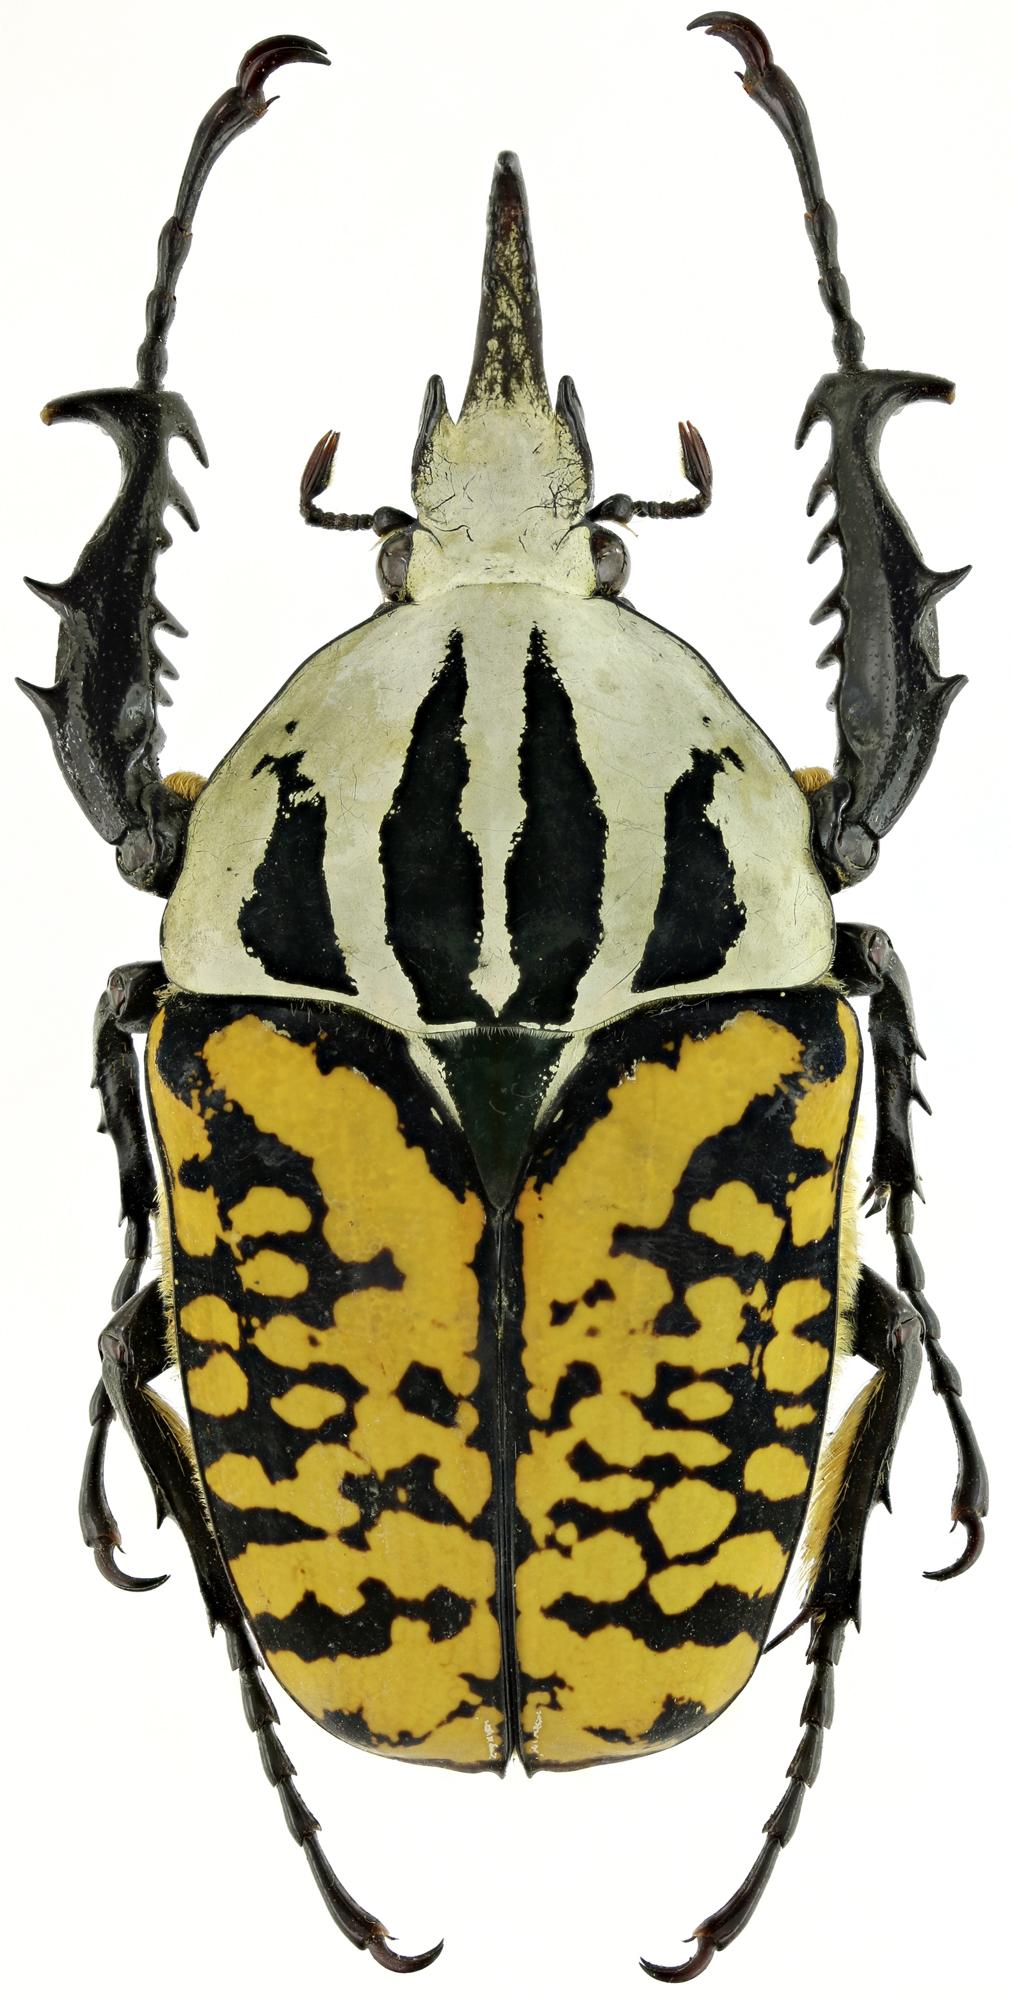 Mecynorhina (Mecynorrhinella) oberthuri kirchneri 19487zs97.jpg